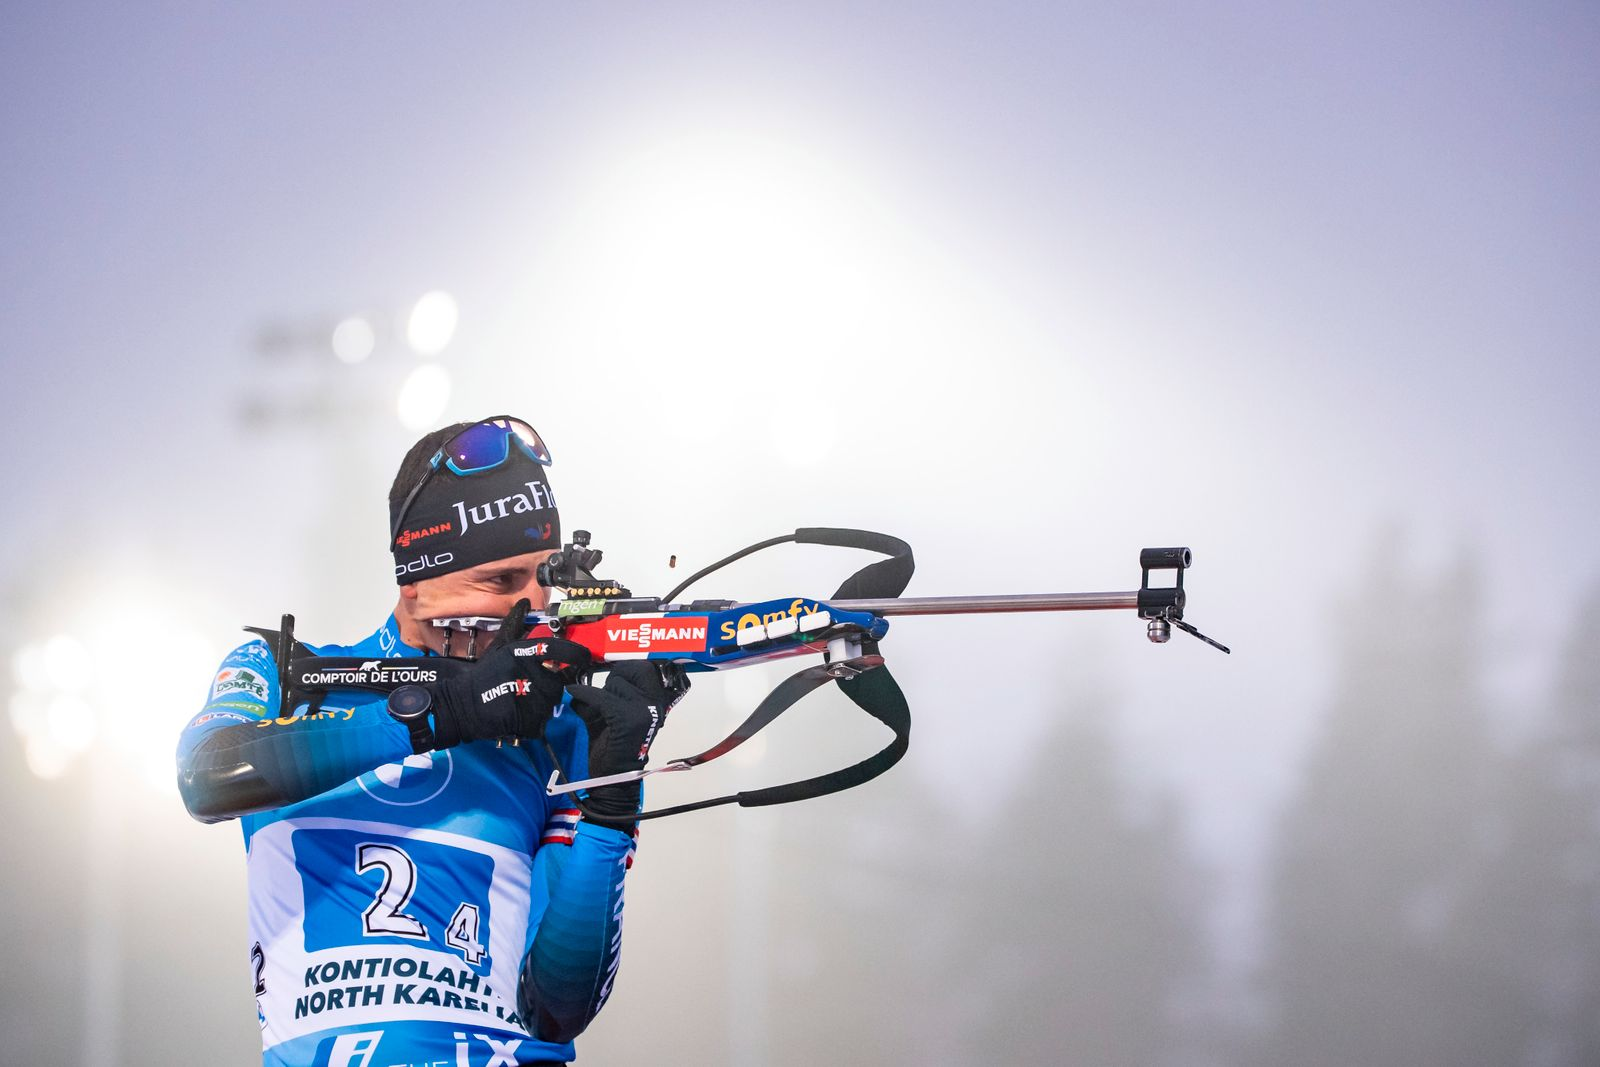 BMW IBU World Cup Biathlon Kontiolahti - Men 4x7.5 km Relay Competition